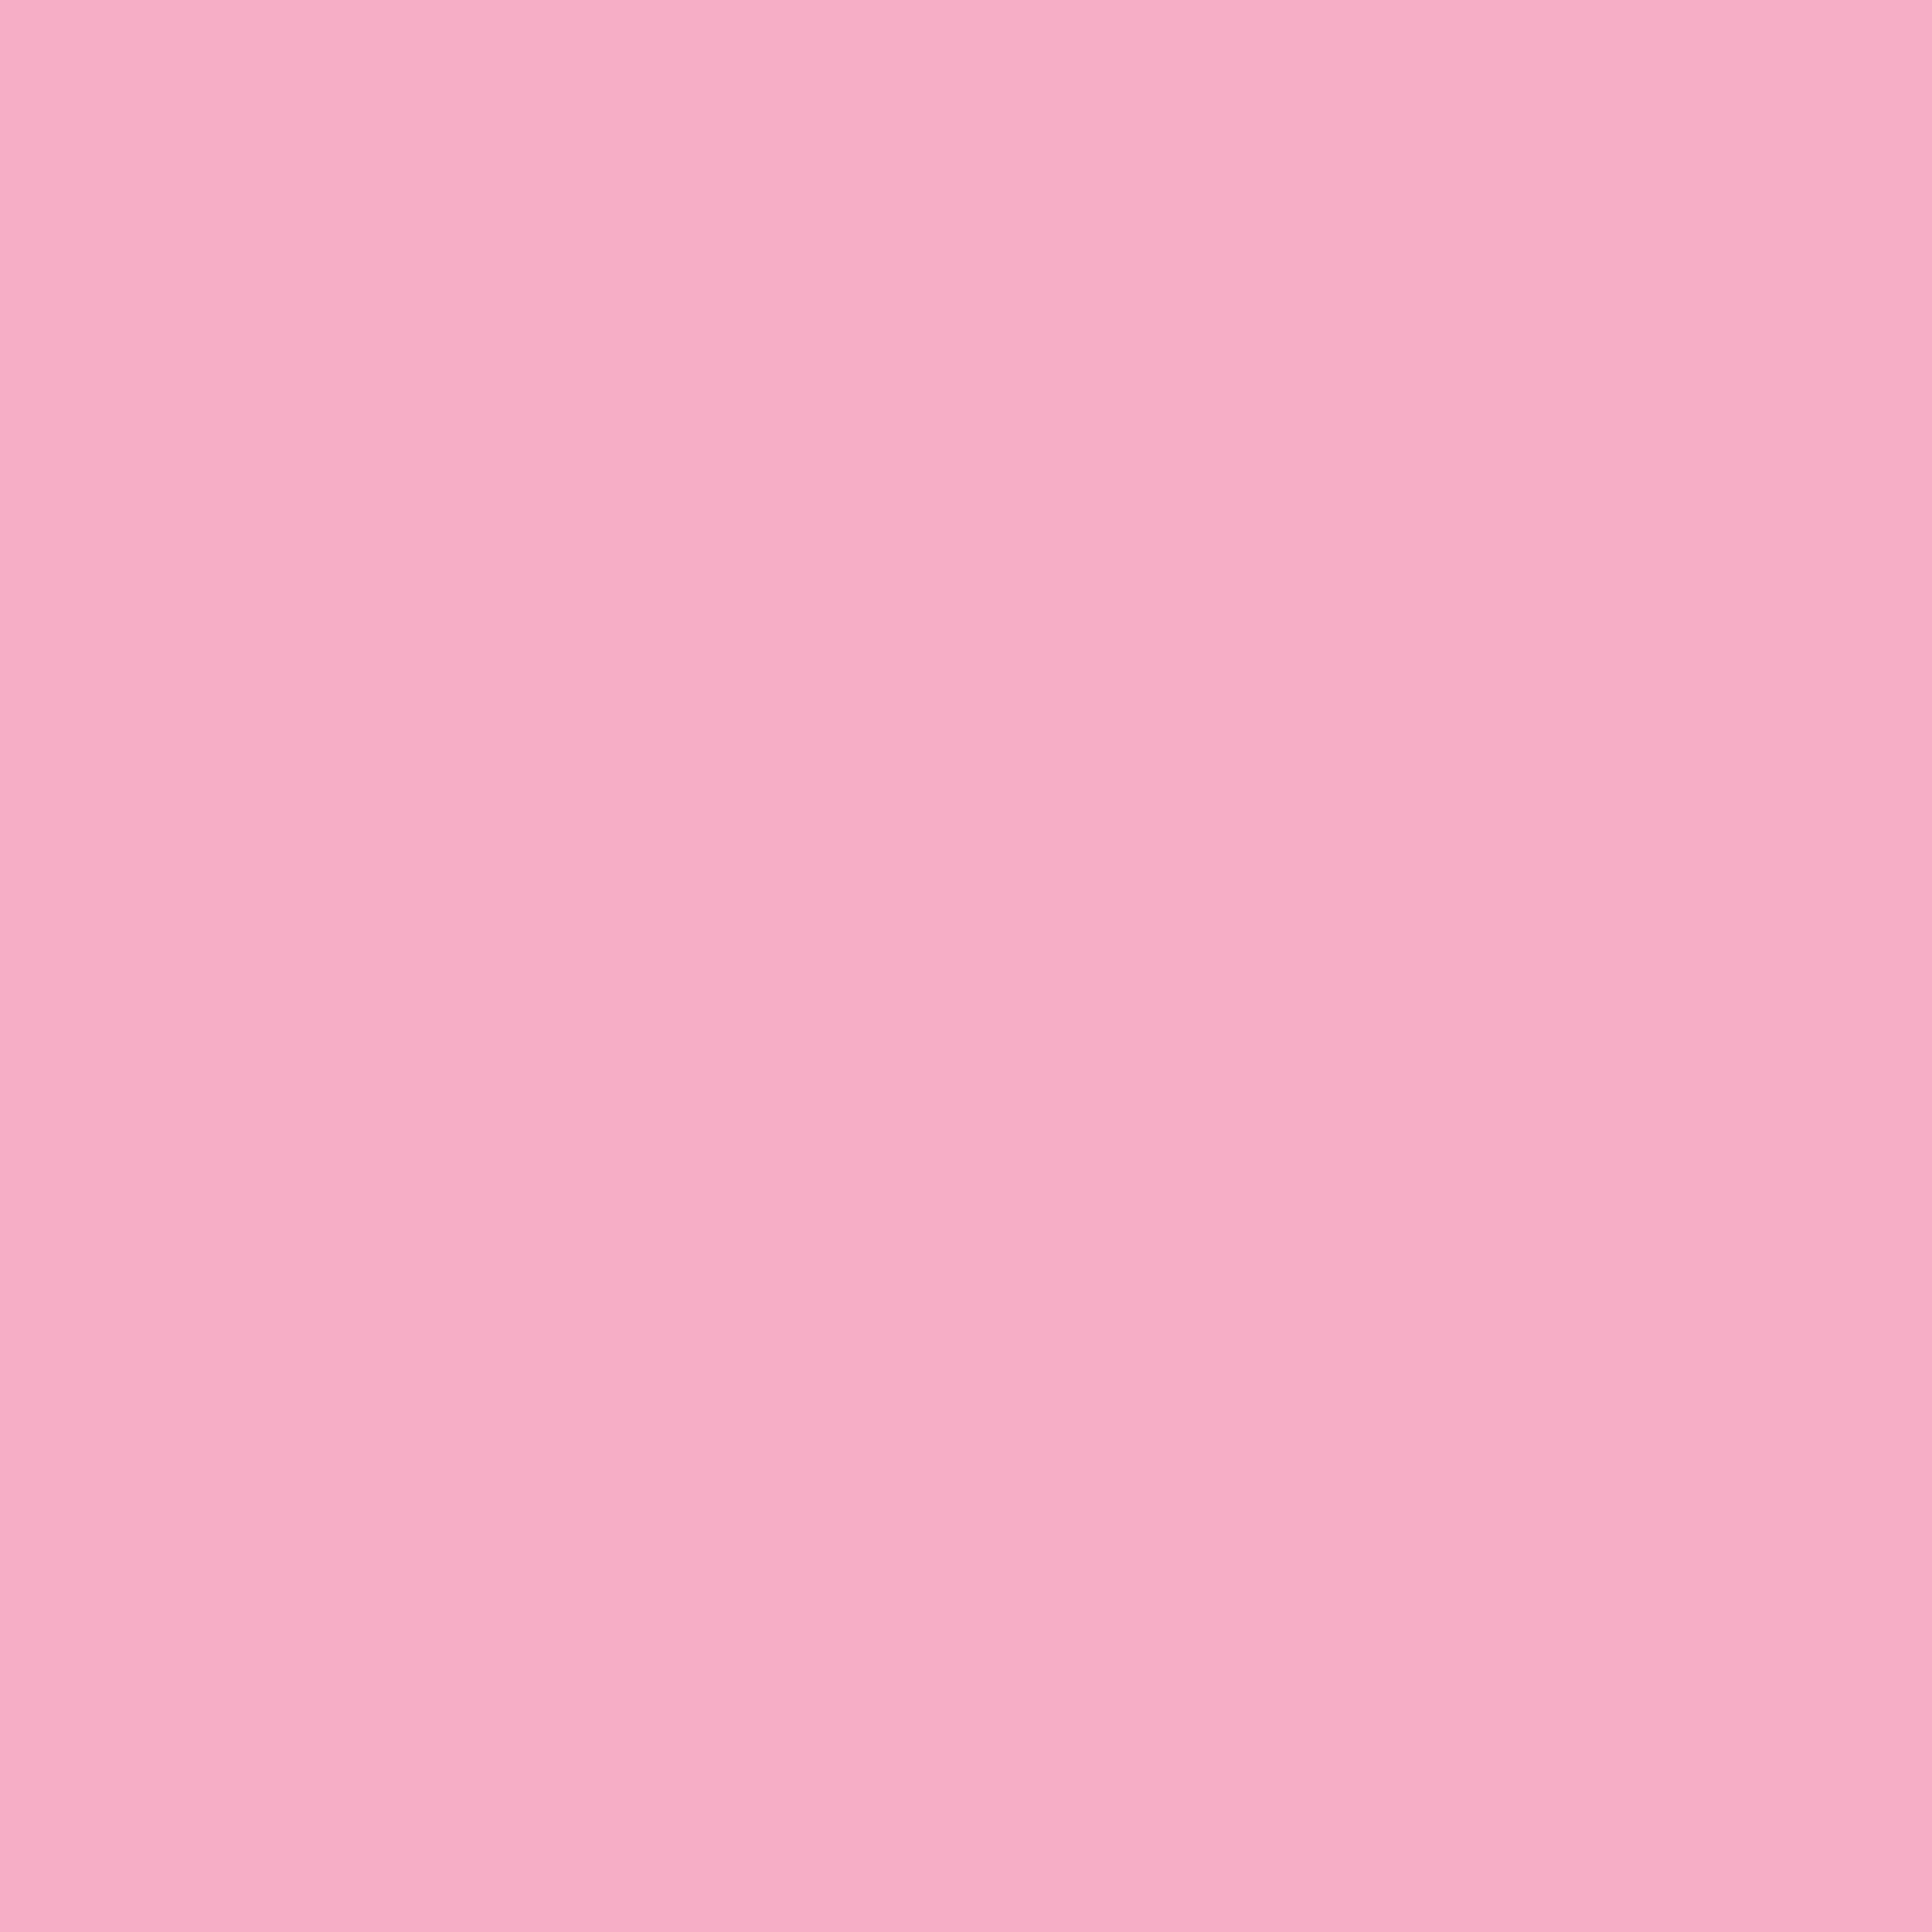 2048x2048 Nadeshiko Pink Solid Color Background